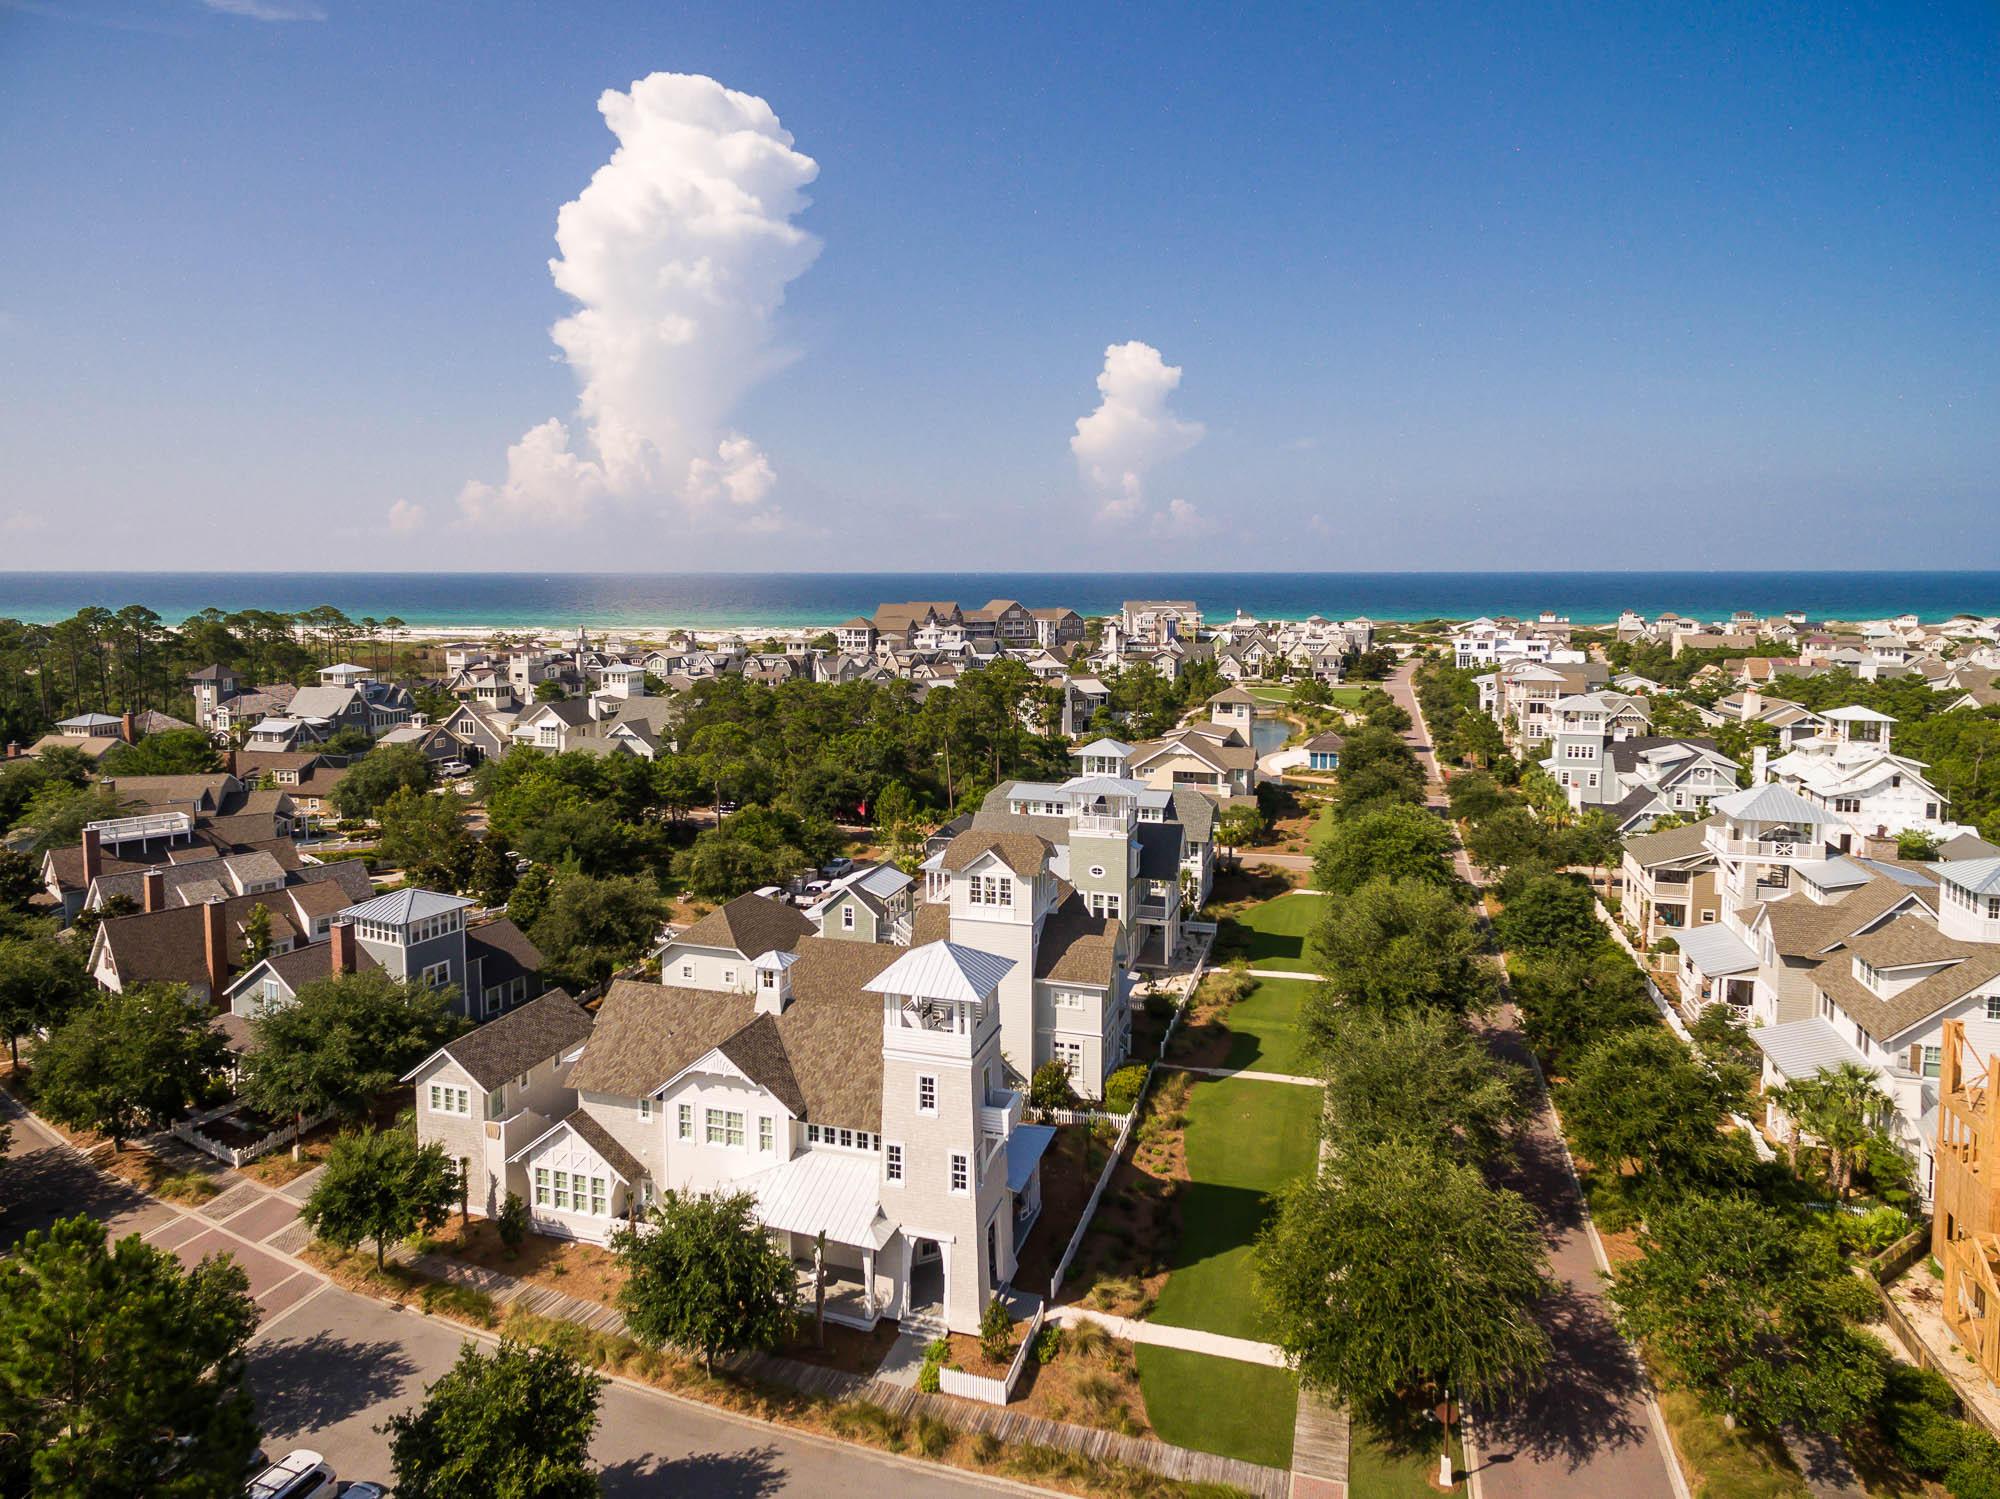 45 Madaket,Inlet Beach,Florida 32461,5 Bedrooms Bedrooms,6 BathroomsBathrooms,Detached single family,Madaket,20131126143817002353000000